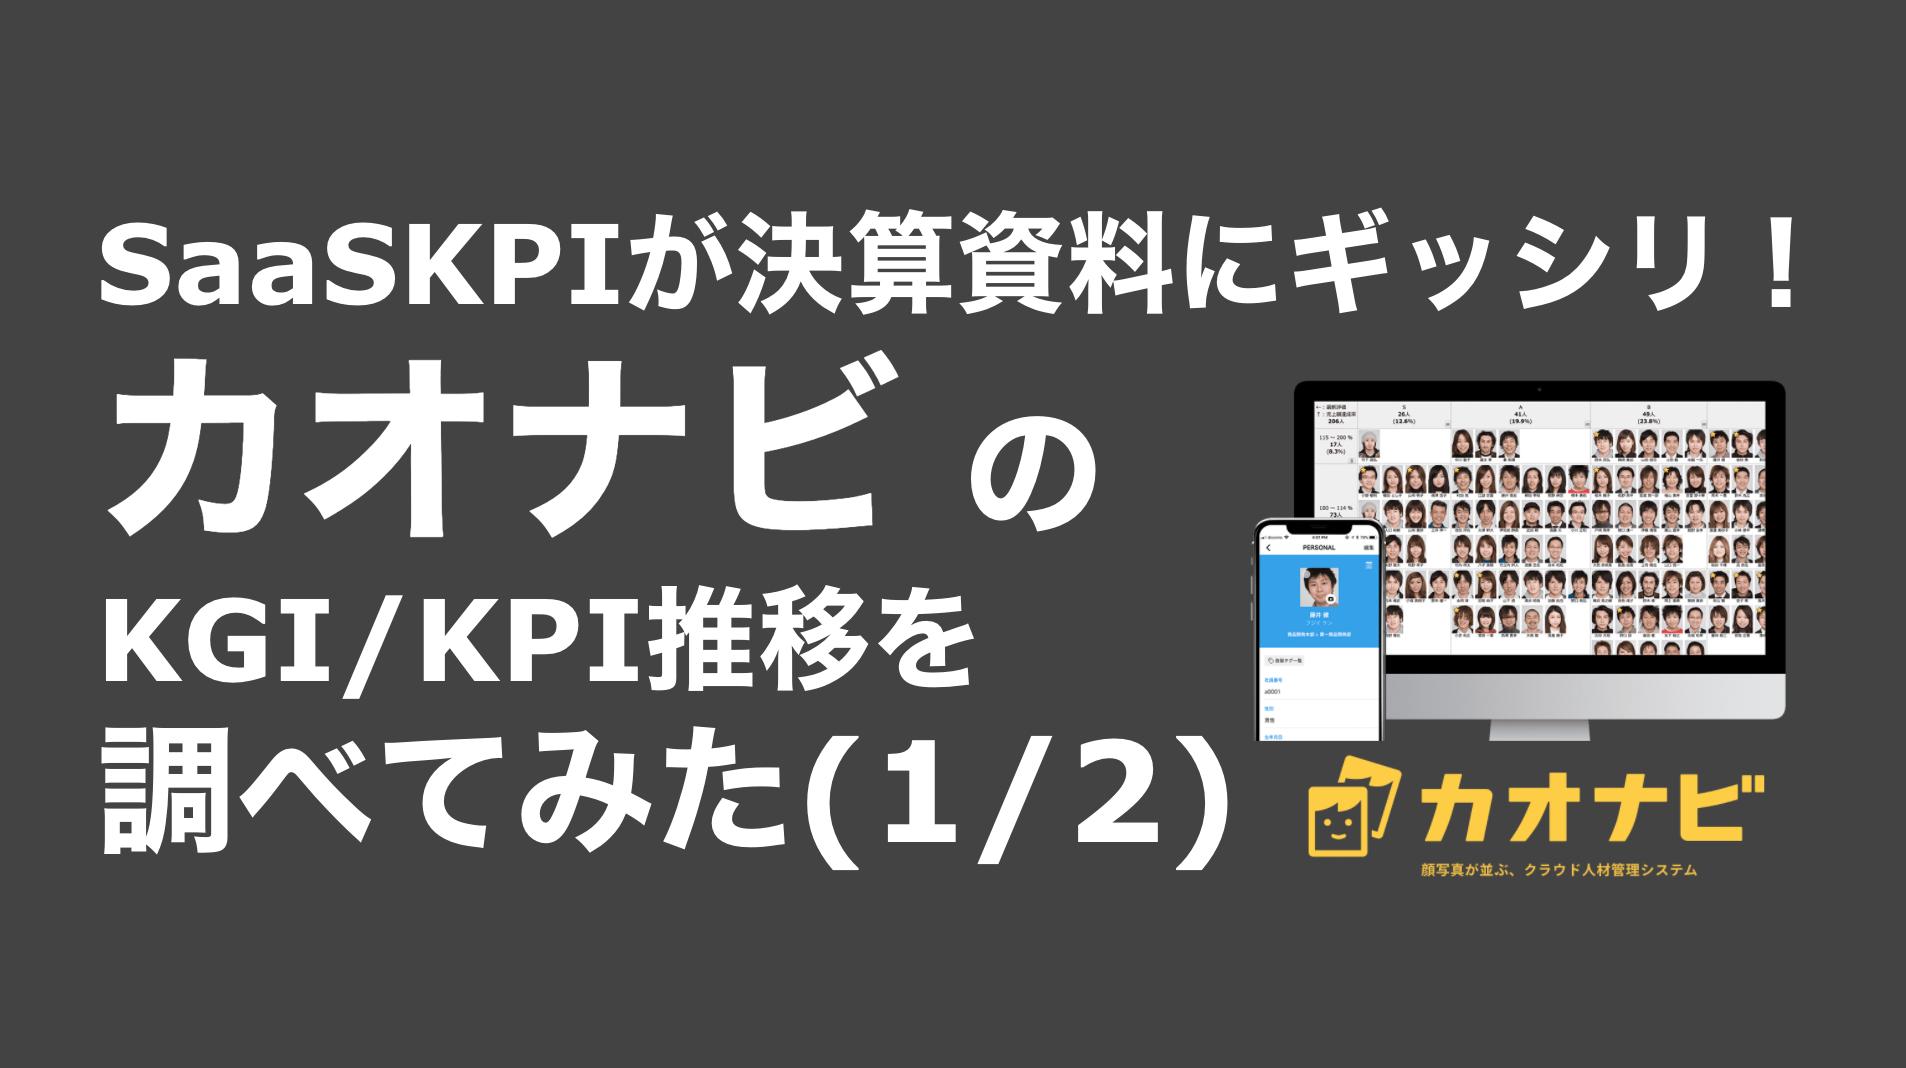 saaslife_SaaSKPIが決算資料にギッシリ!カオナビ のKGI/KPI推移を調べてみた(1/2)